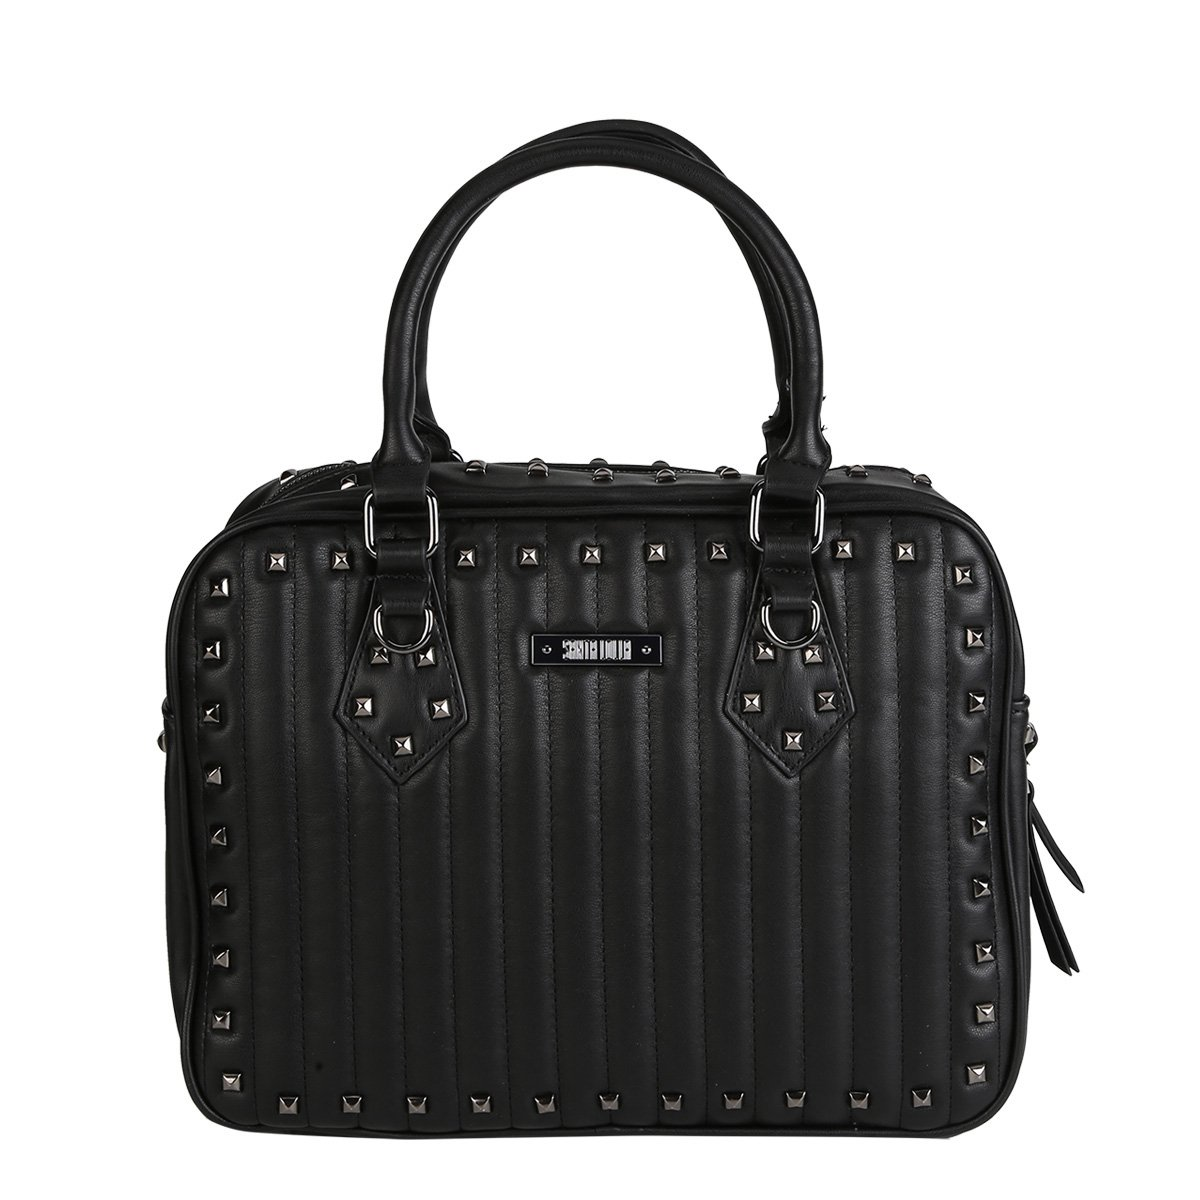 Bolsa Santa Lolla Handbag Mestiço Feminina - Compre Agora  17de30f0fdd